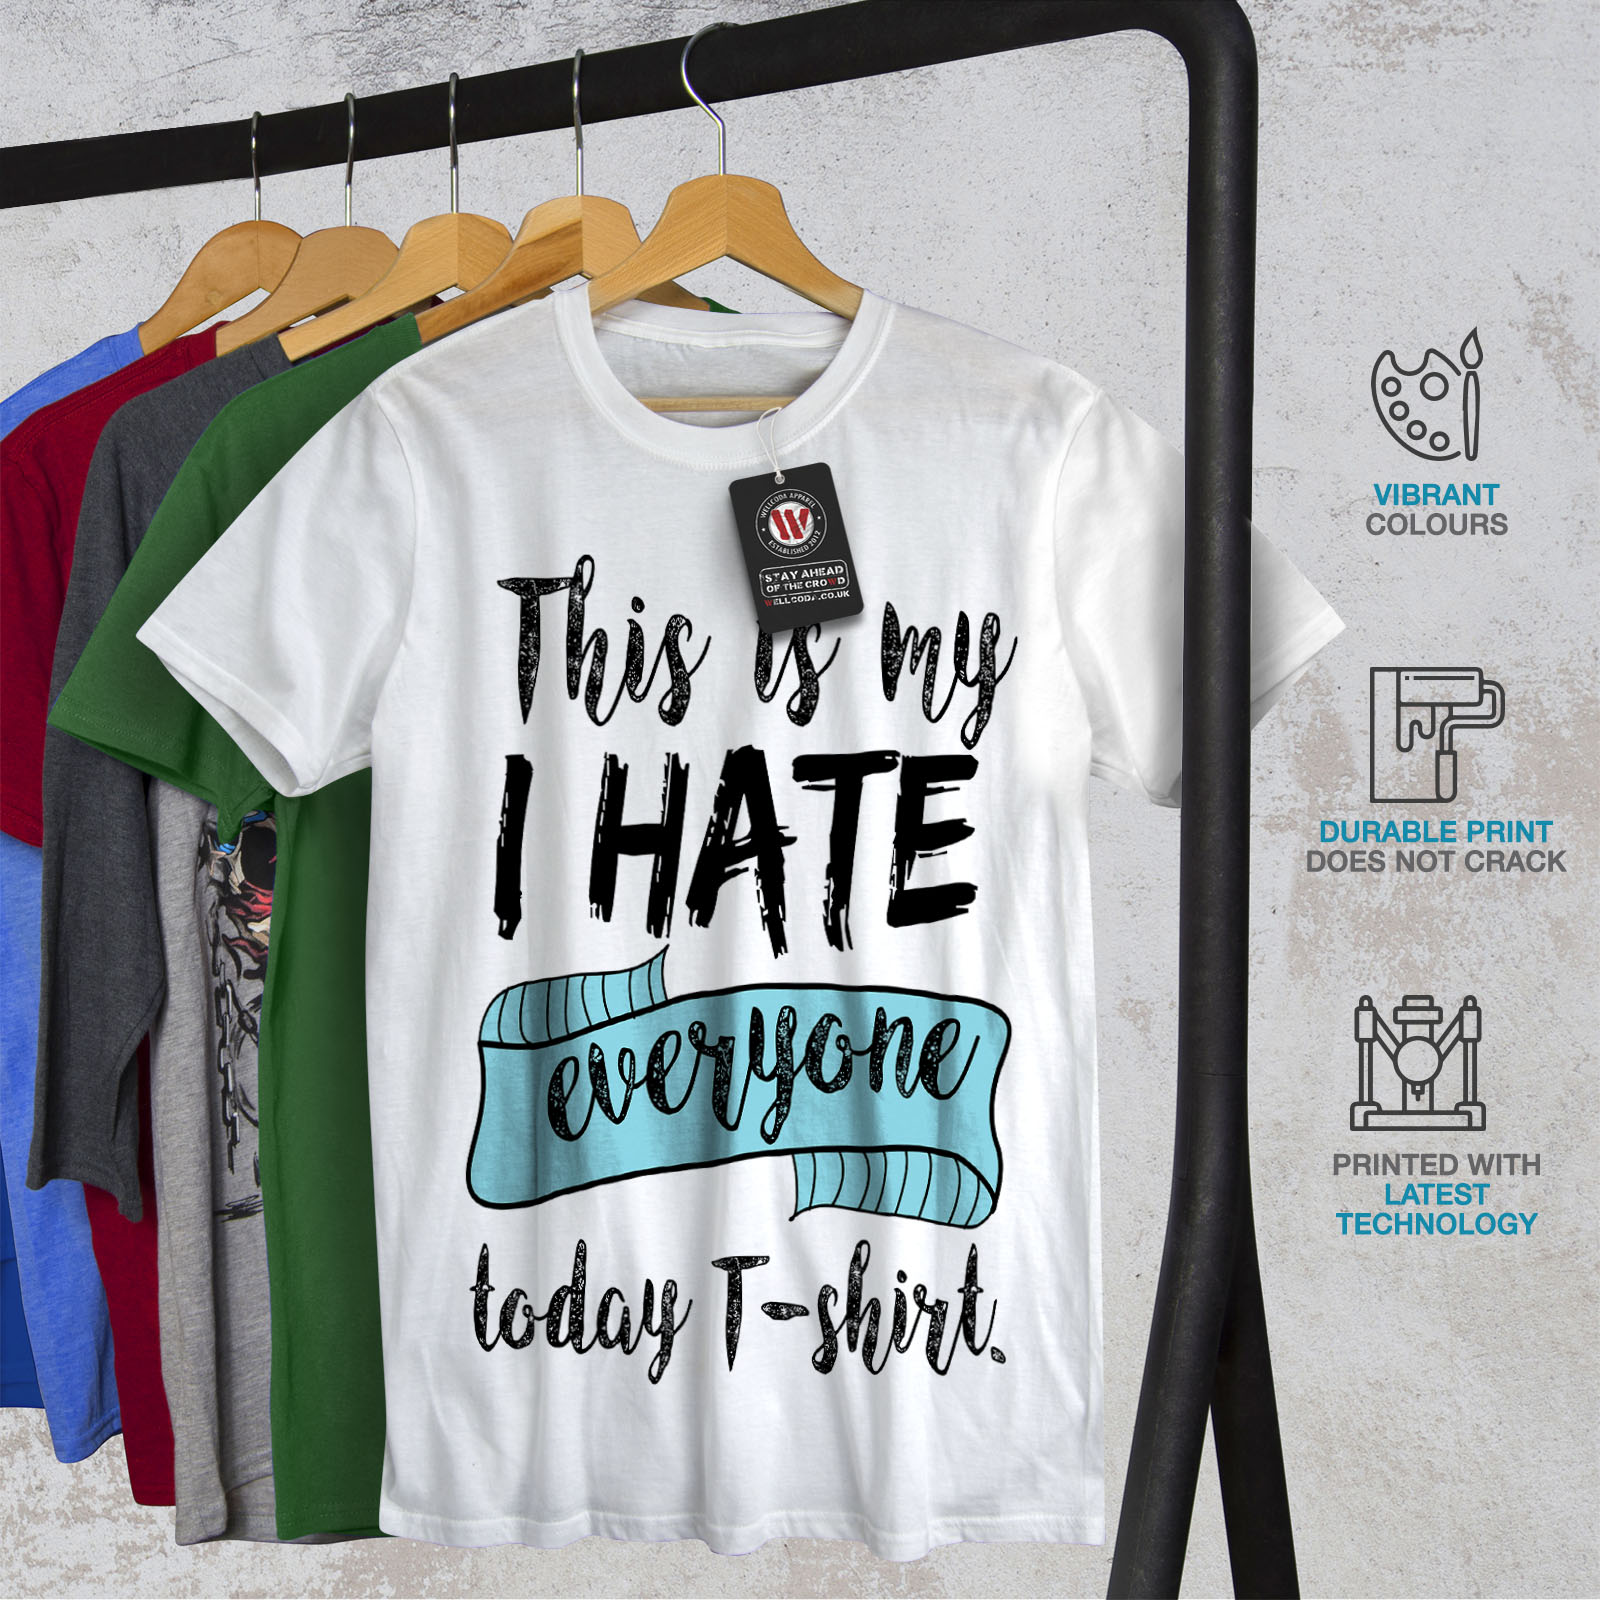 Wellcoda-hasse-alle-heute-Herren-T-Shirt-lustige-Grafikdesign-Printed-Tee Indexbild 12